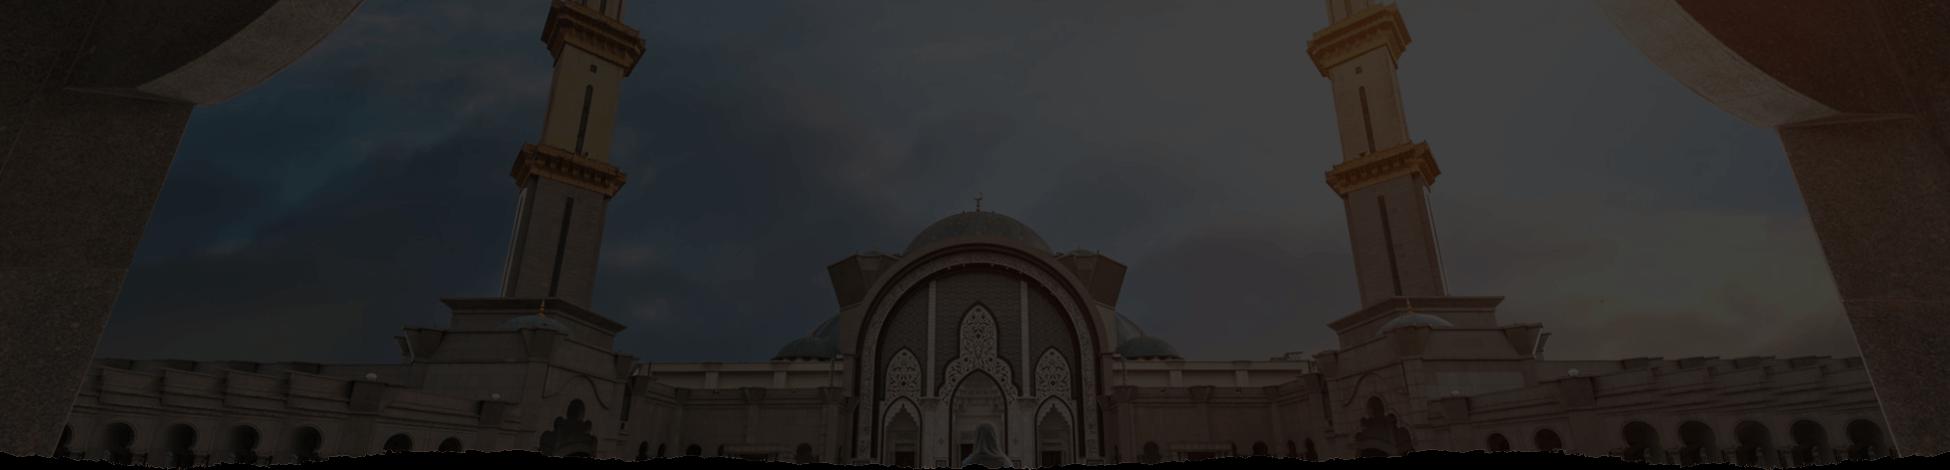 https://ibadurrahman.in/wp-content/uploads/2019/10/services-head-1.png